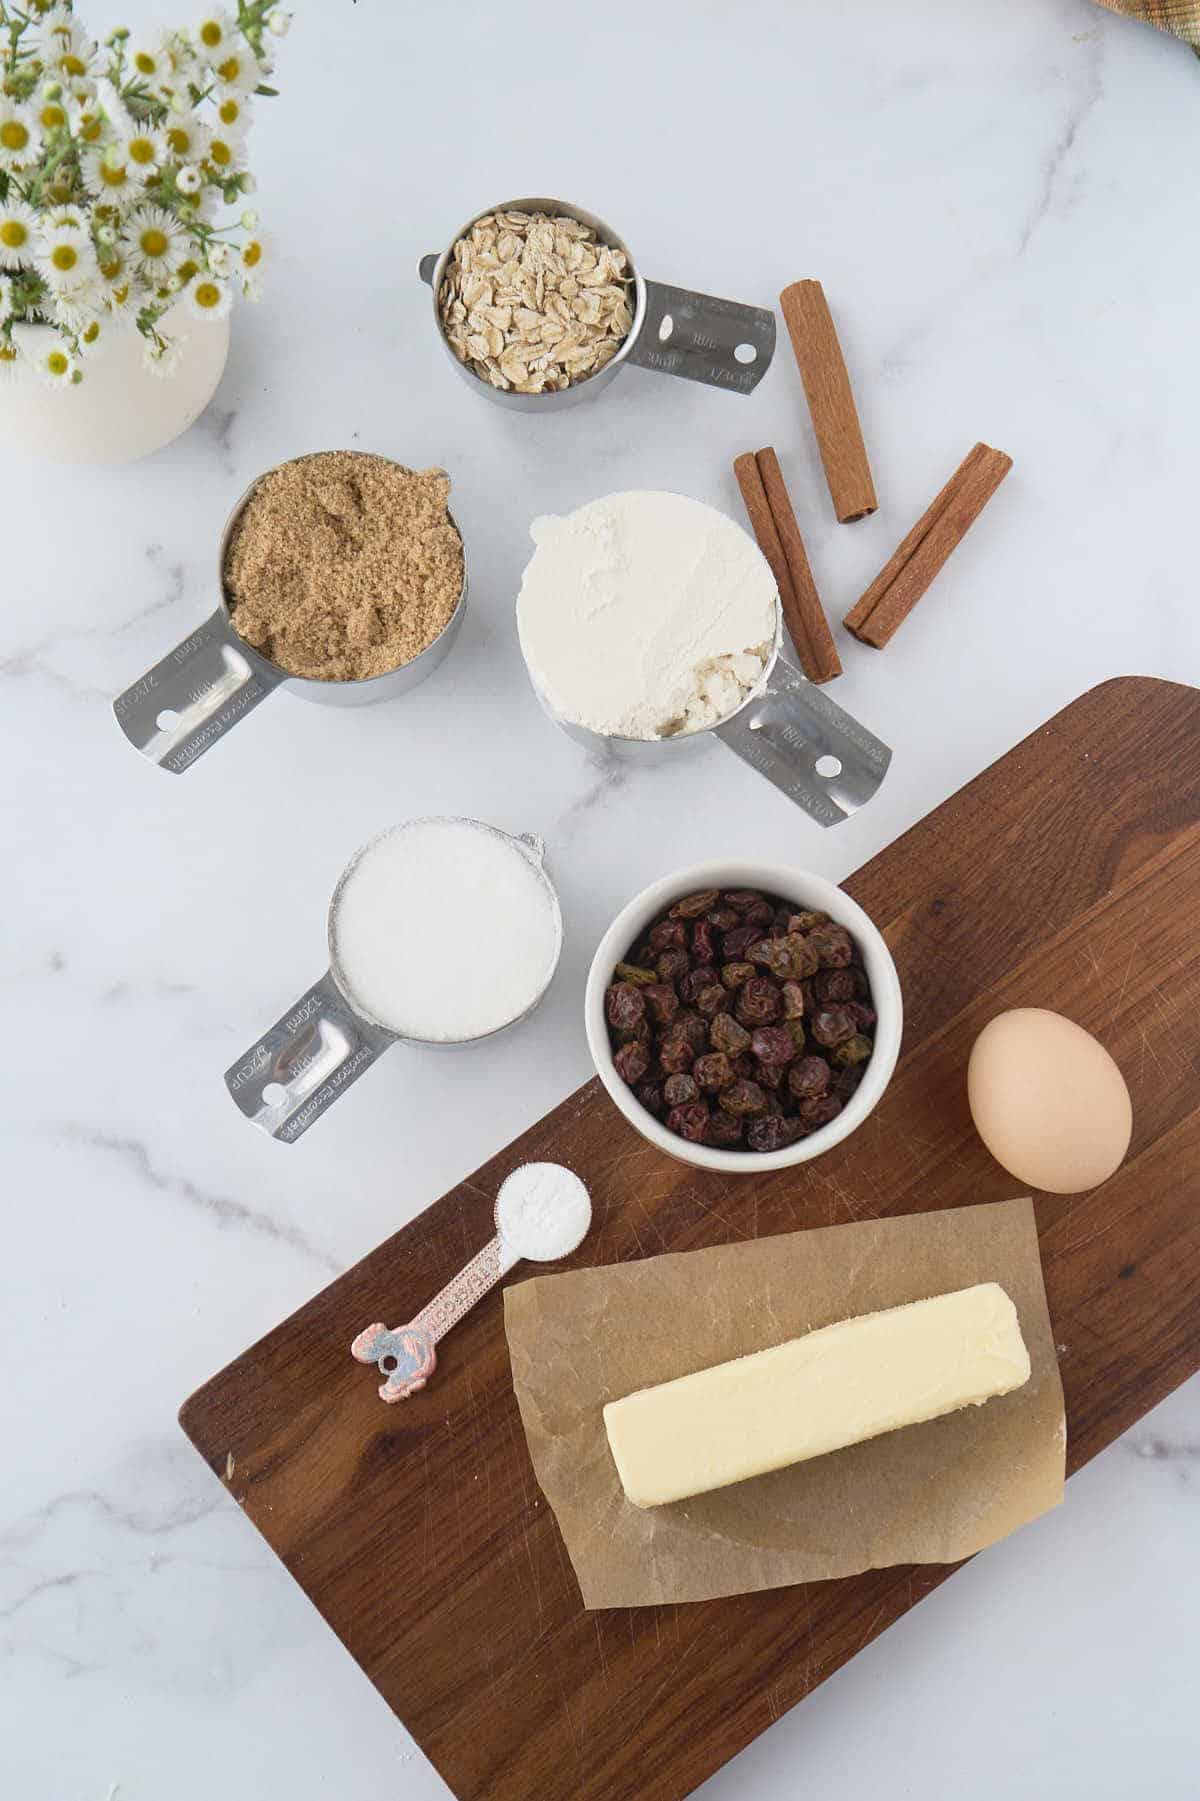 butter, sugar, oats, flour, raisins, and cinnamon sticks on marble counter